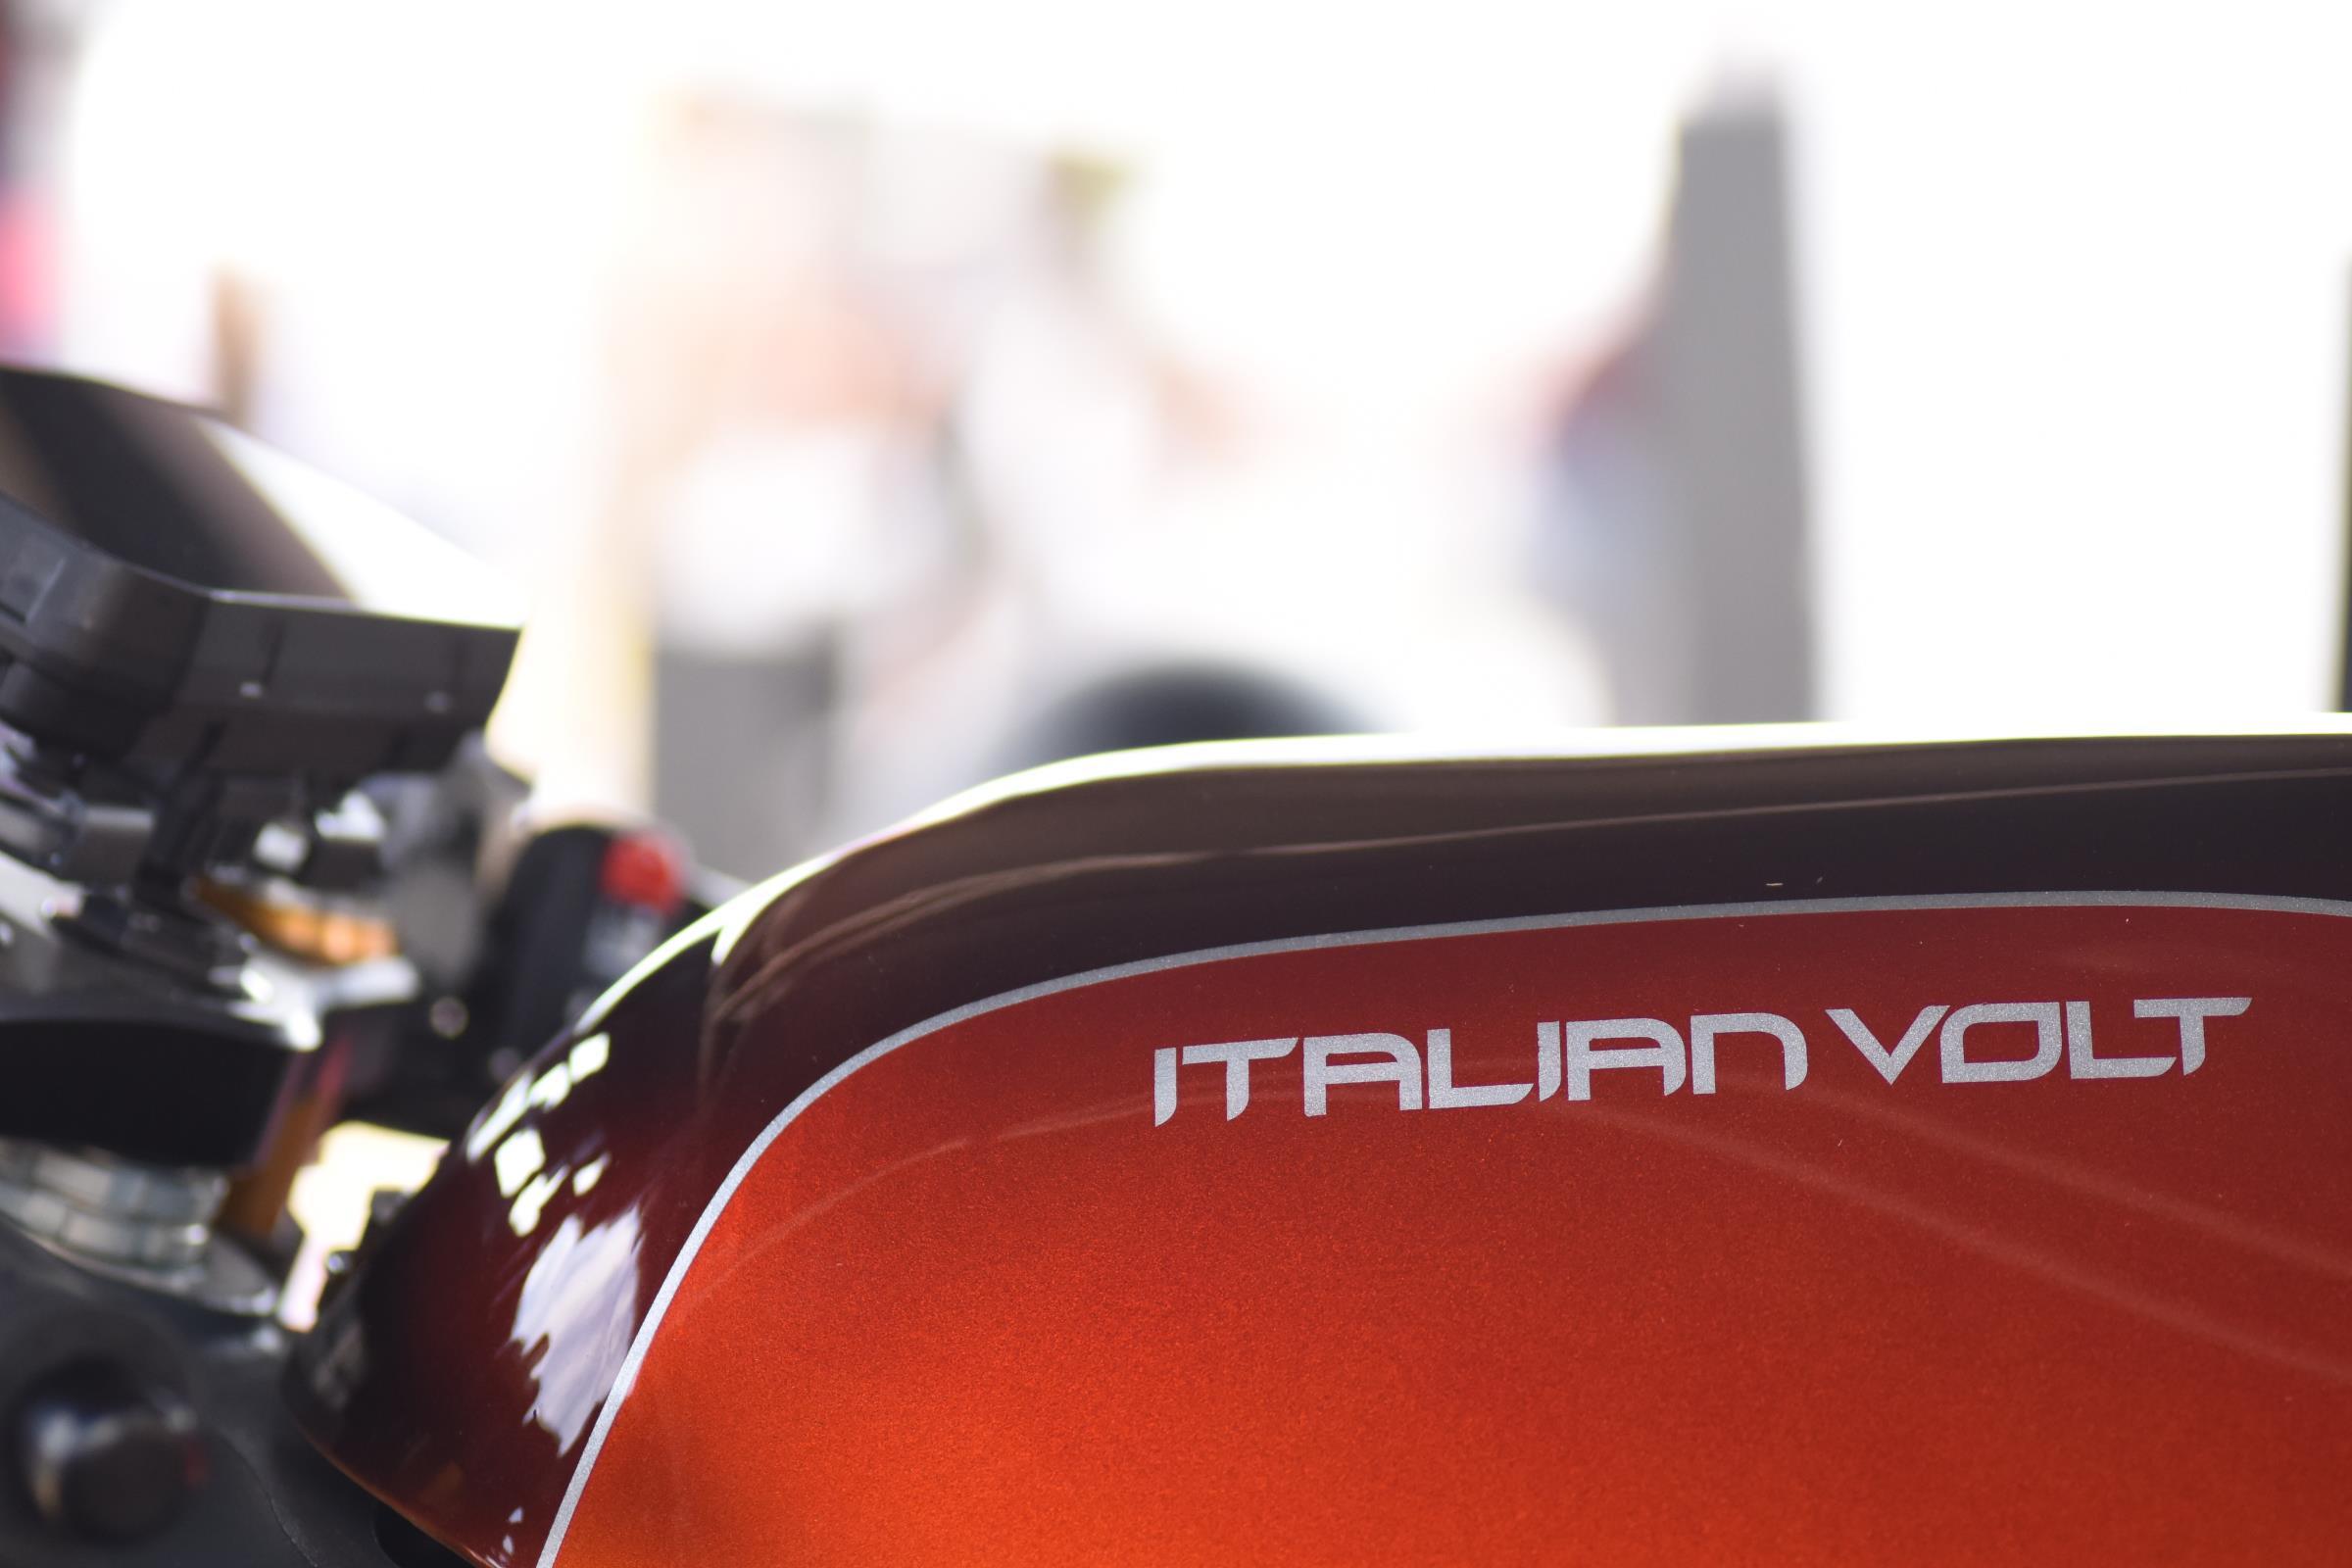 italian_volt_electric_motor_news_51